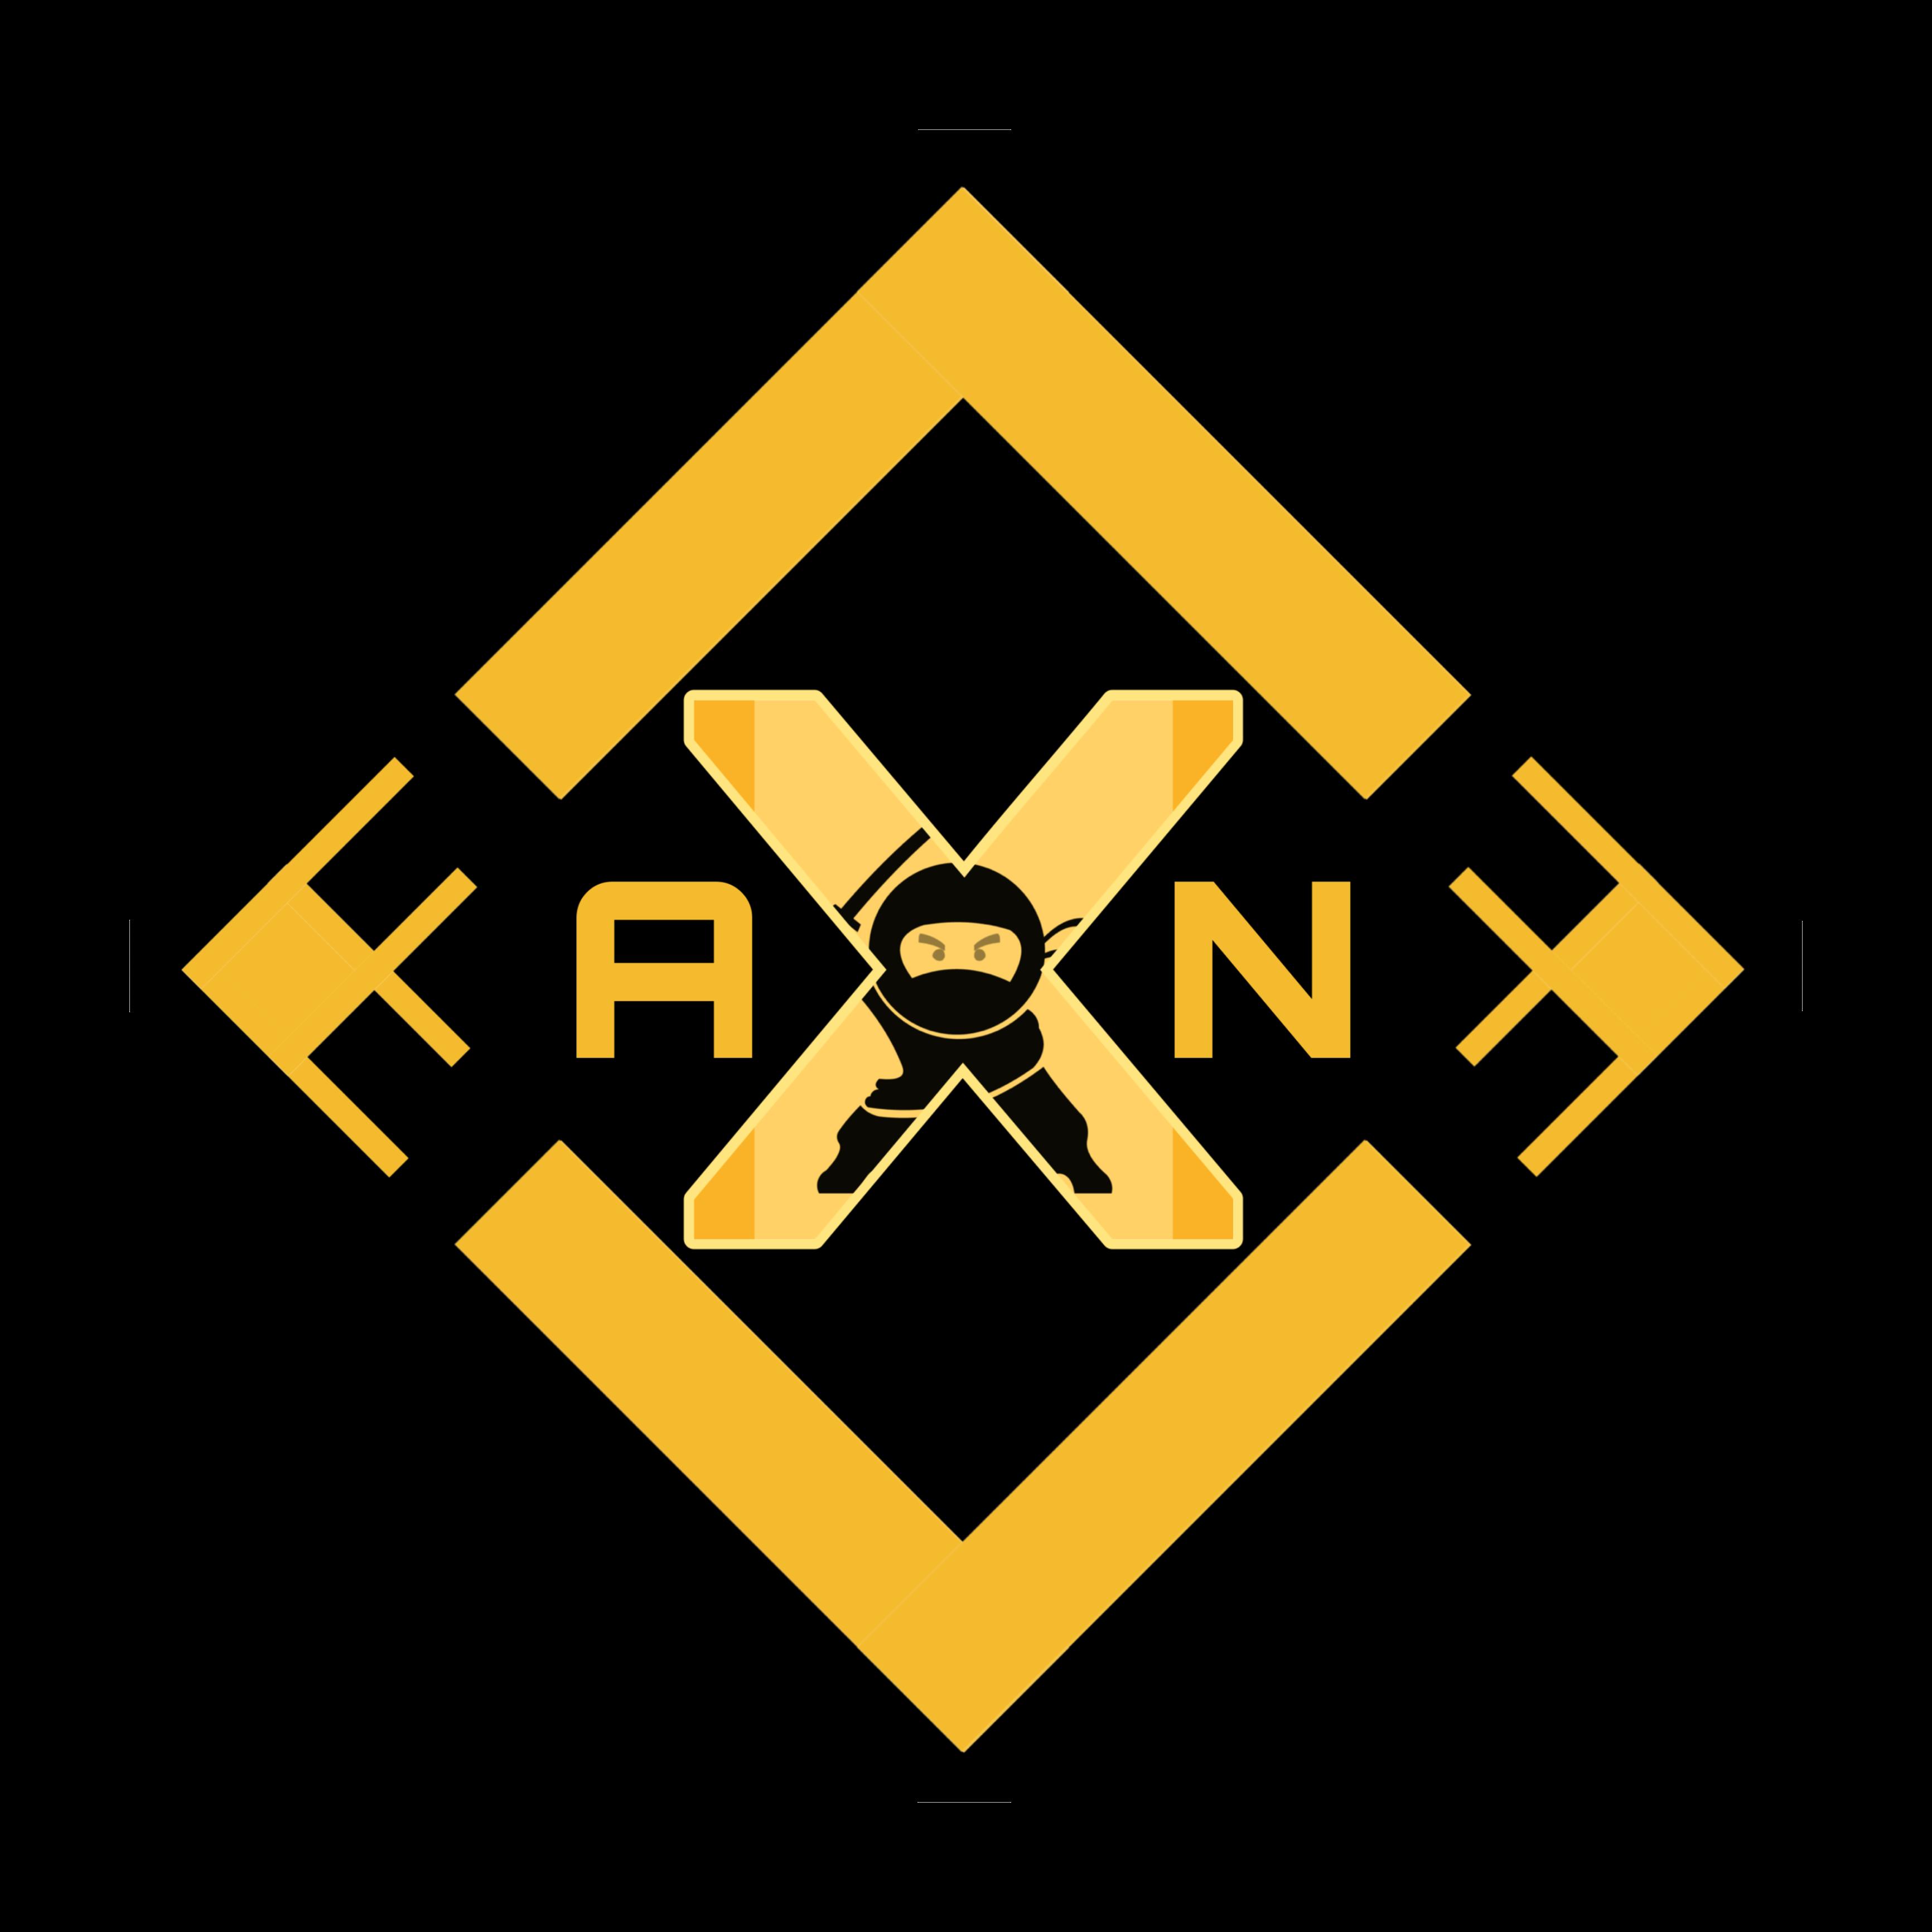 https://solidproof.io/storage/logos/ALEnF8ijCRVSPh4C3RCQXx4Tb5ULXLe1O3JYvBjA.png